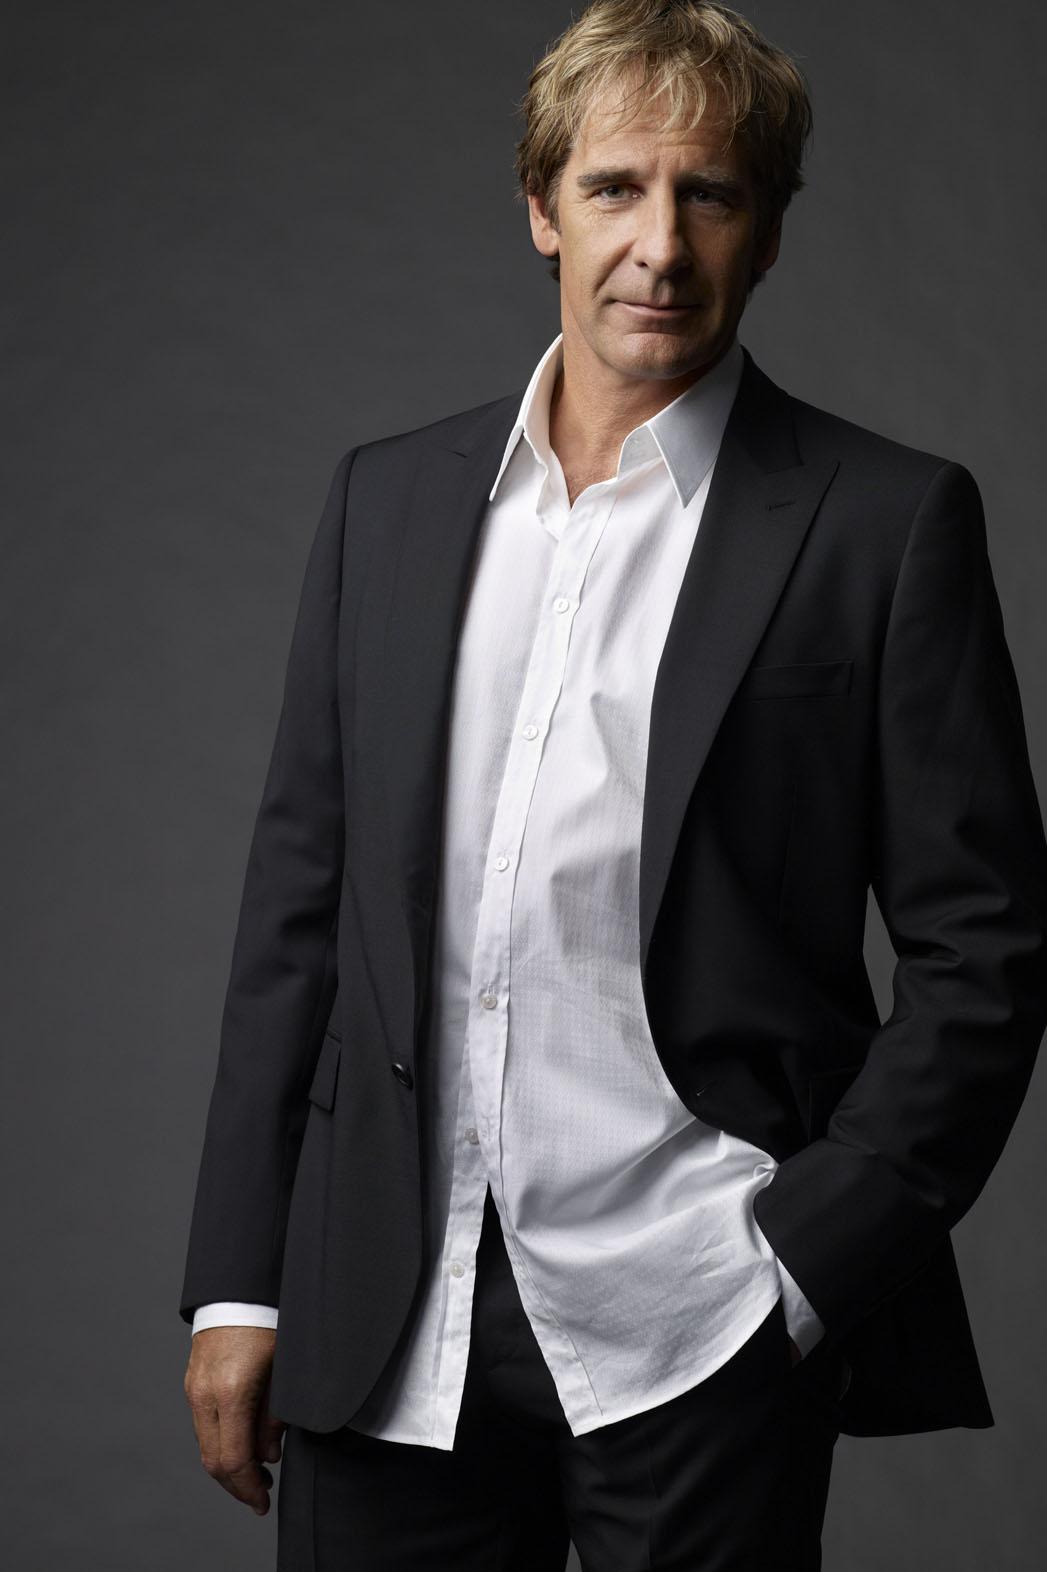 Scott Bakula Portrait - P 2014